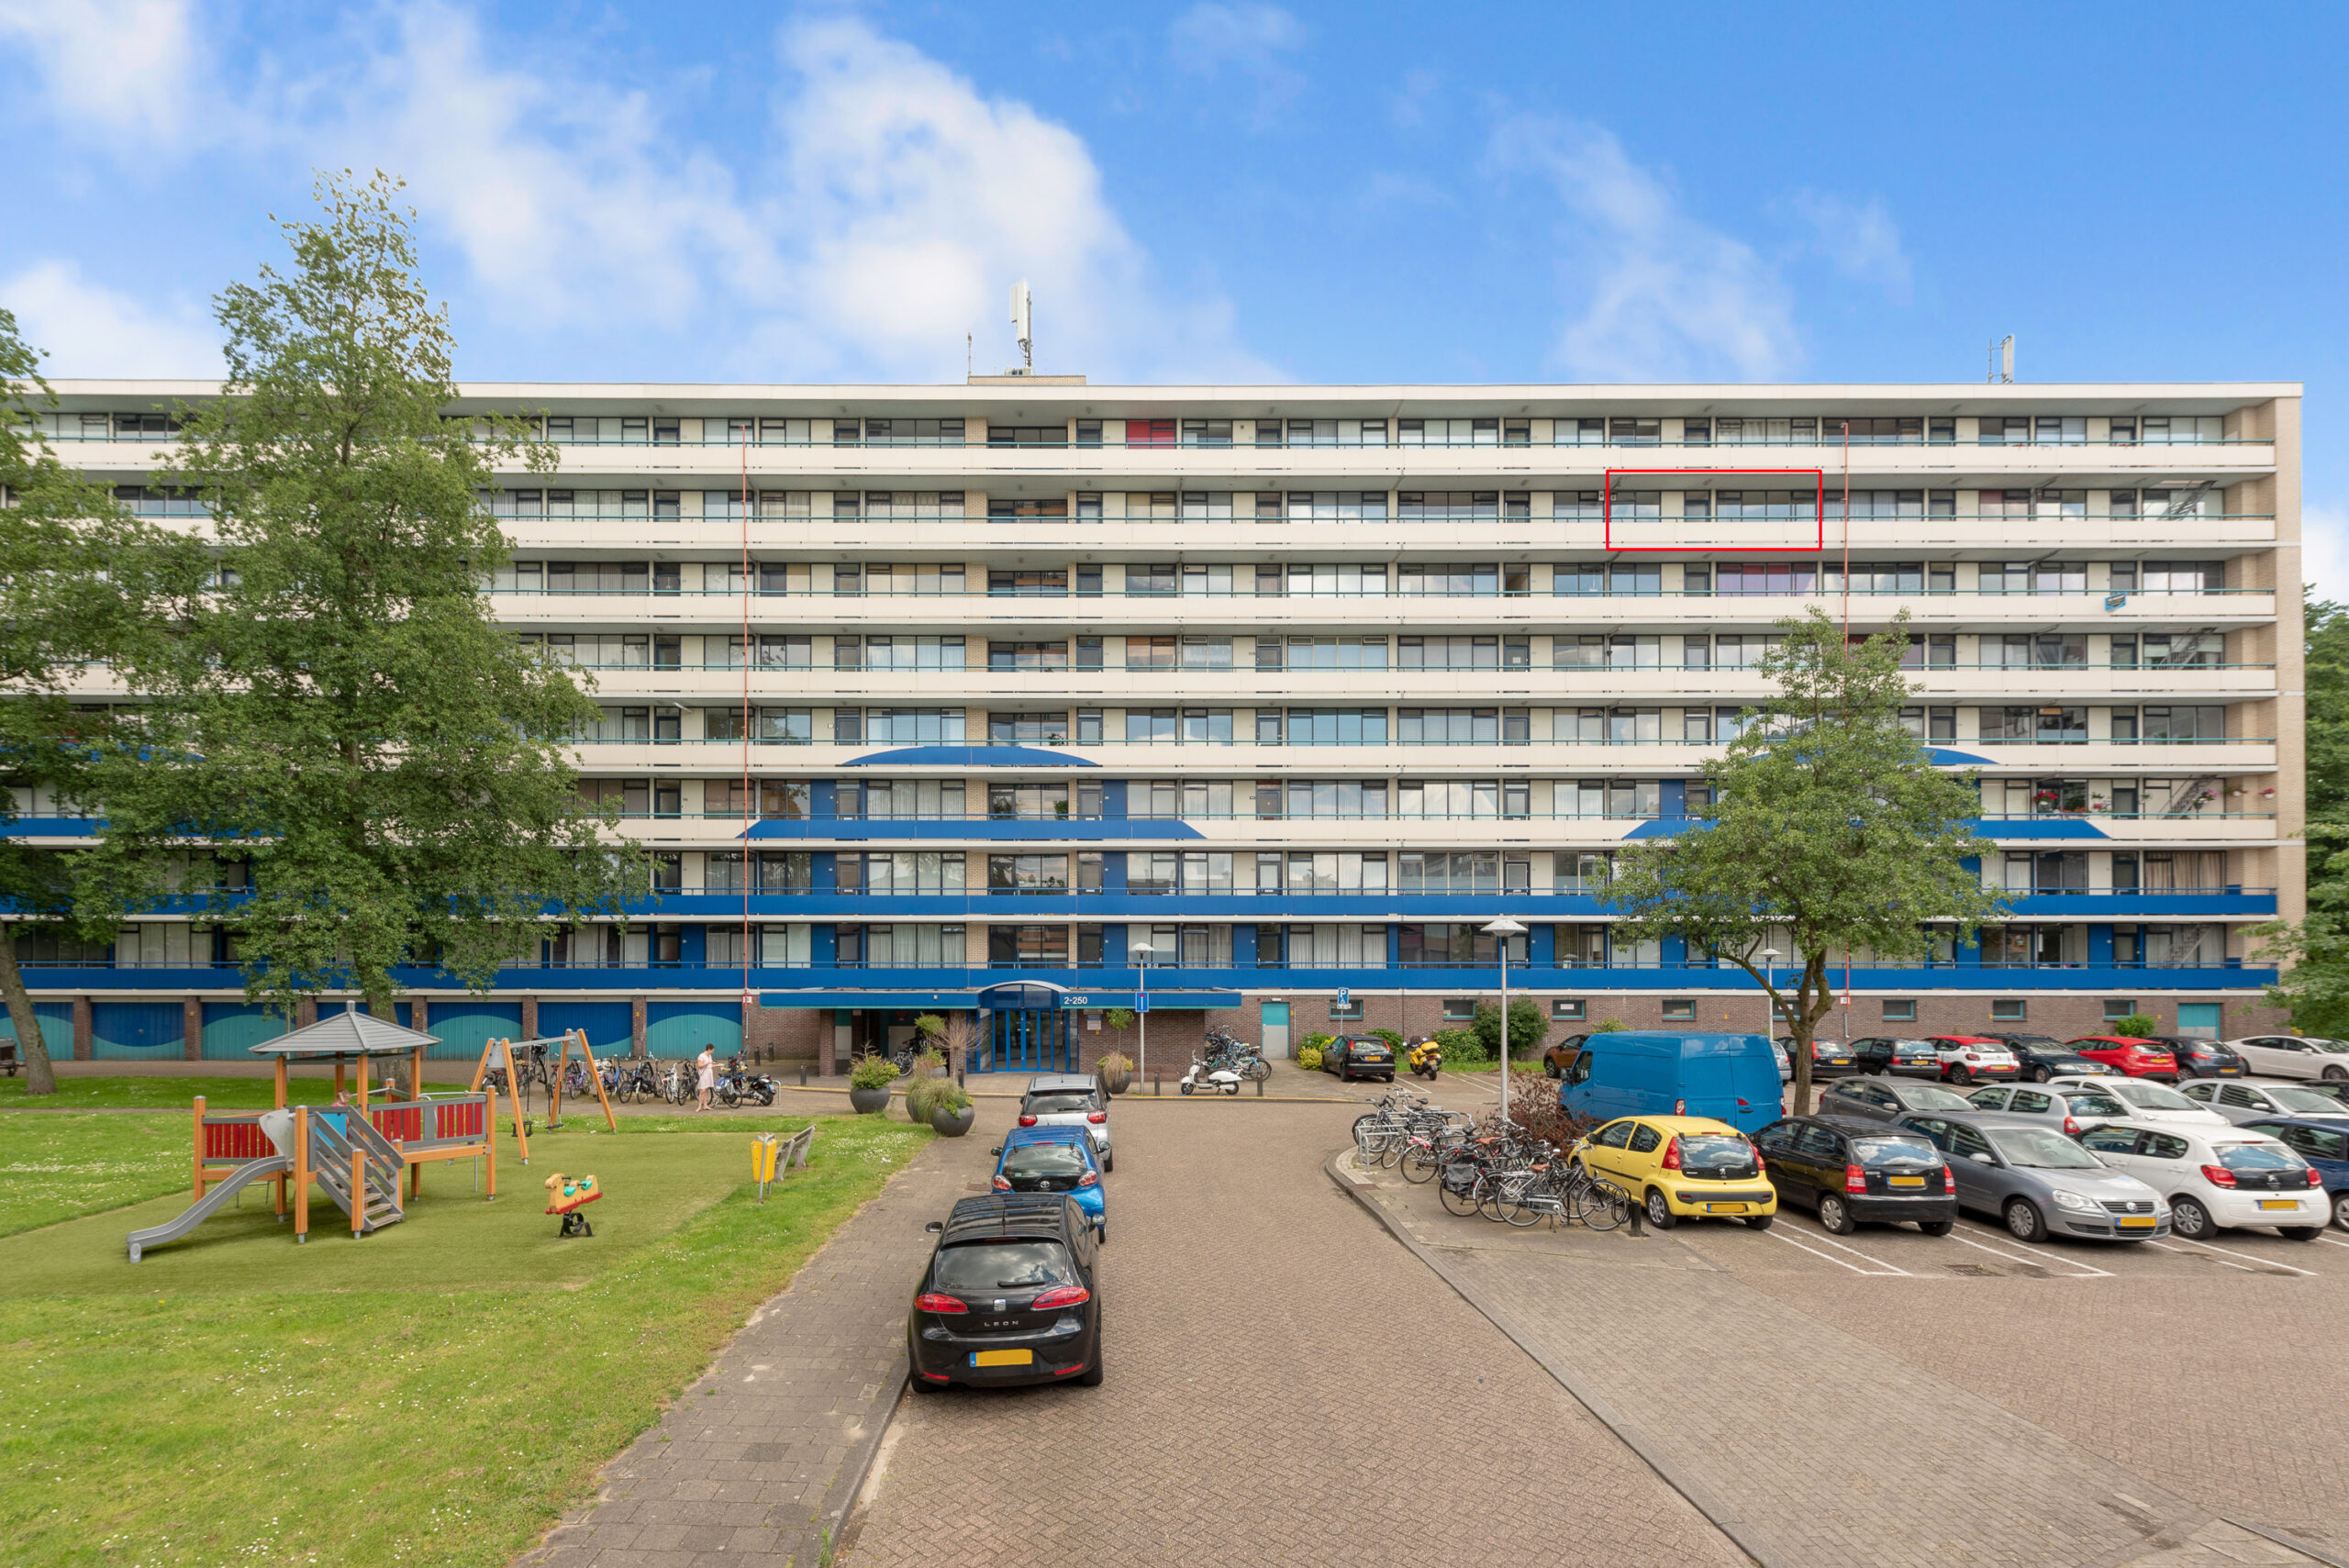 Rhodosdreef 218, 3562 TM Utrecht